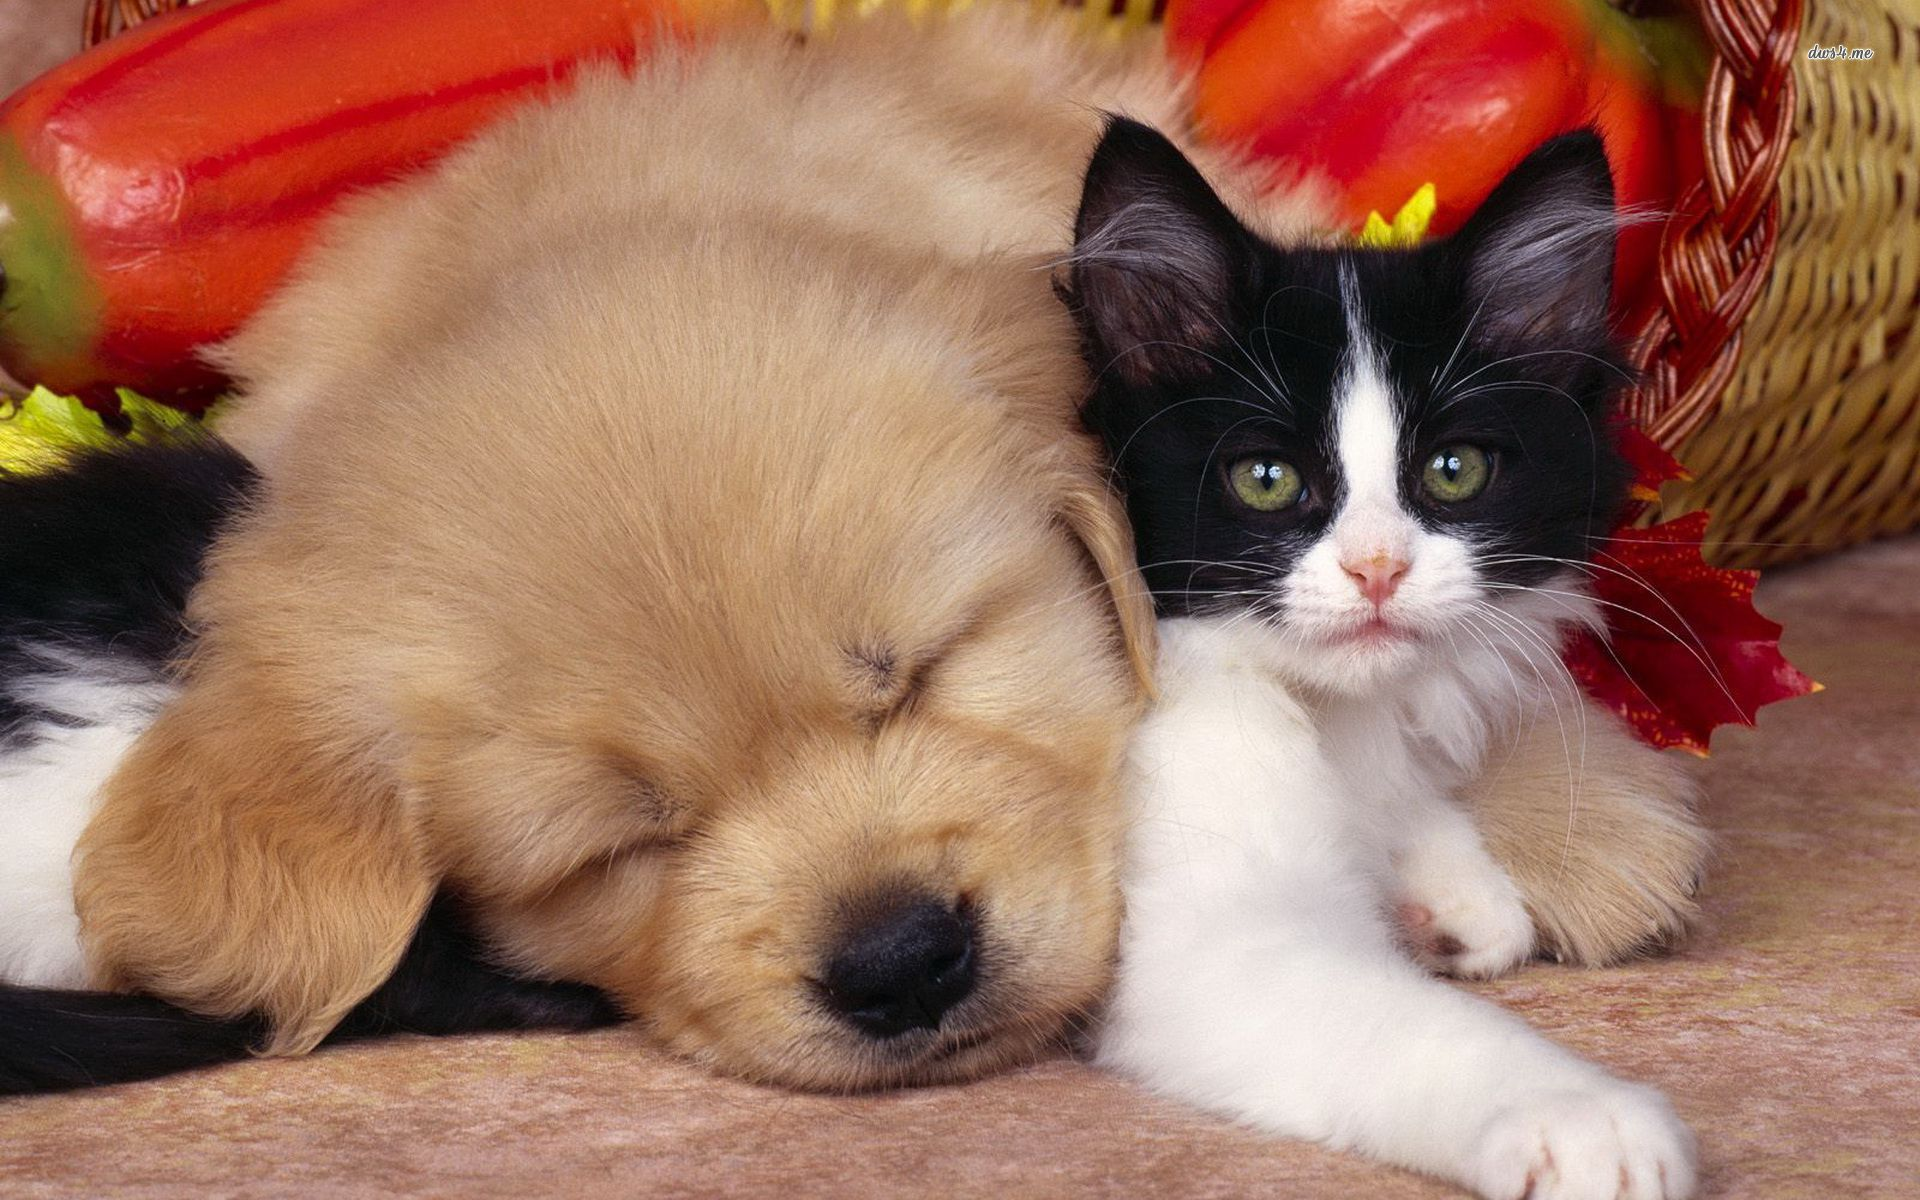 cute dog and cat hd wallpaperjpg 1920x1200